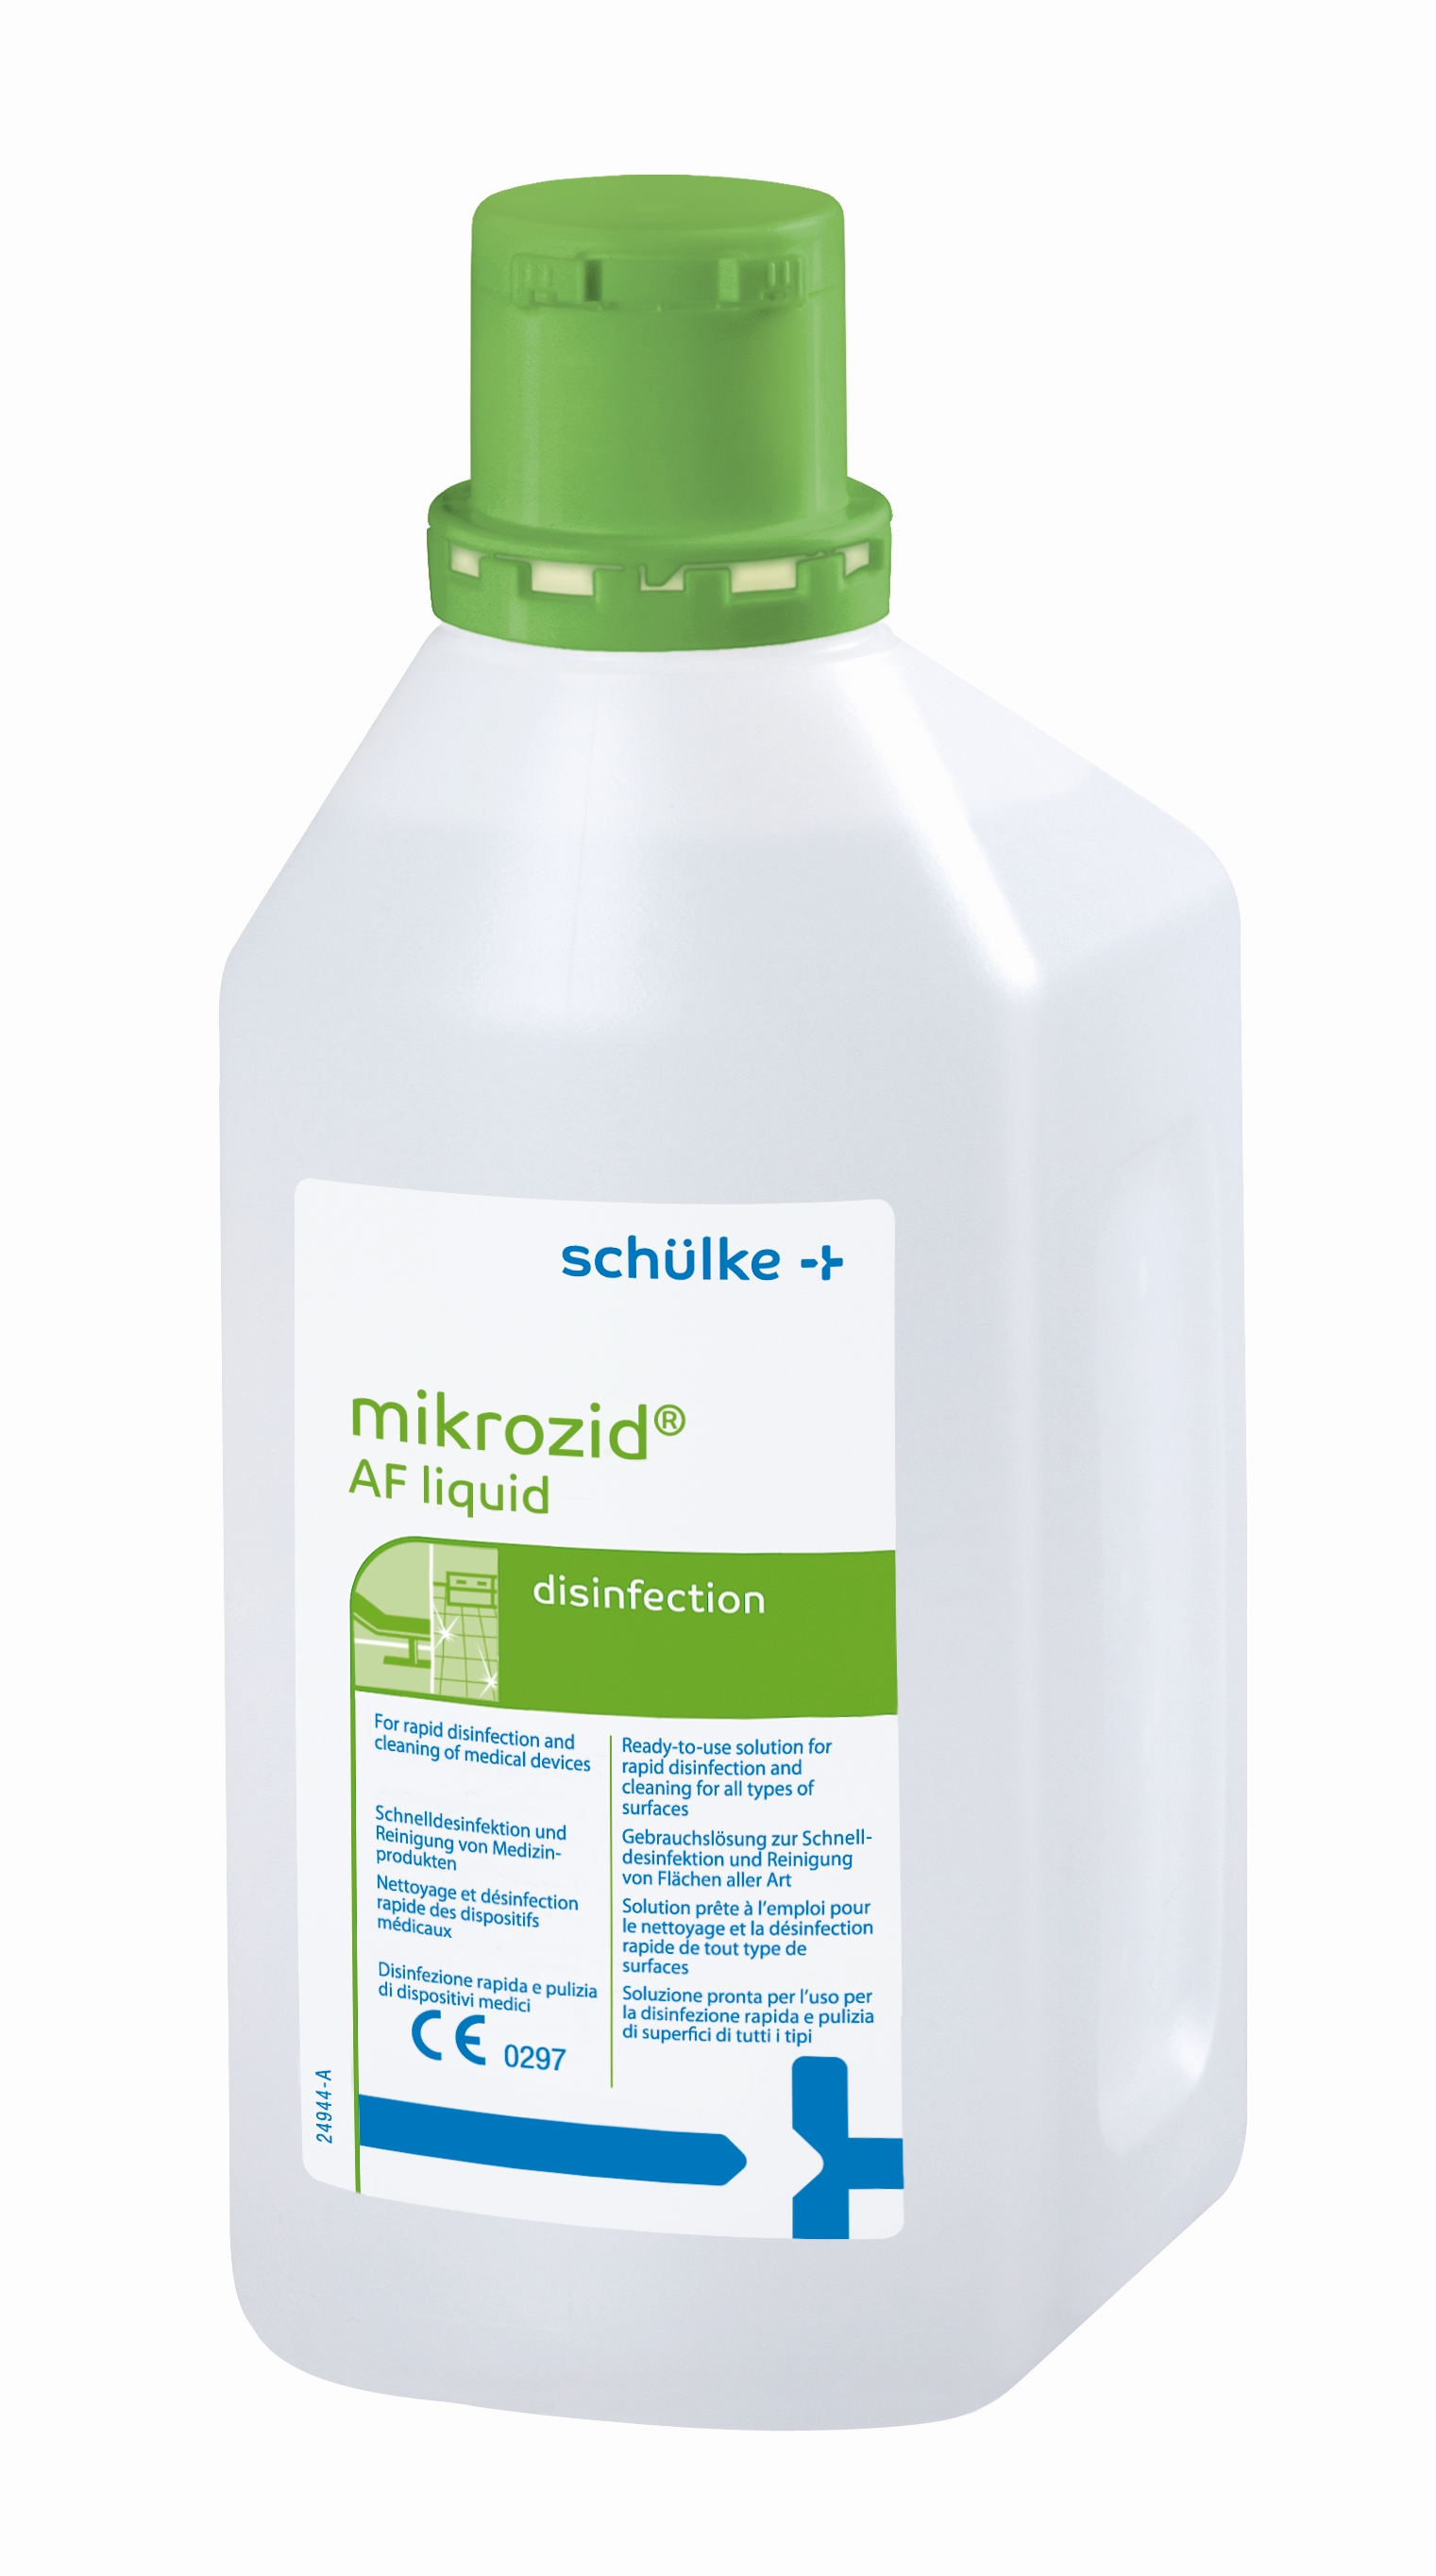 mikrozid AF liquid - Flächendesinfektionsmittel